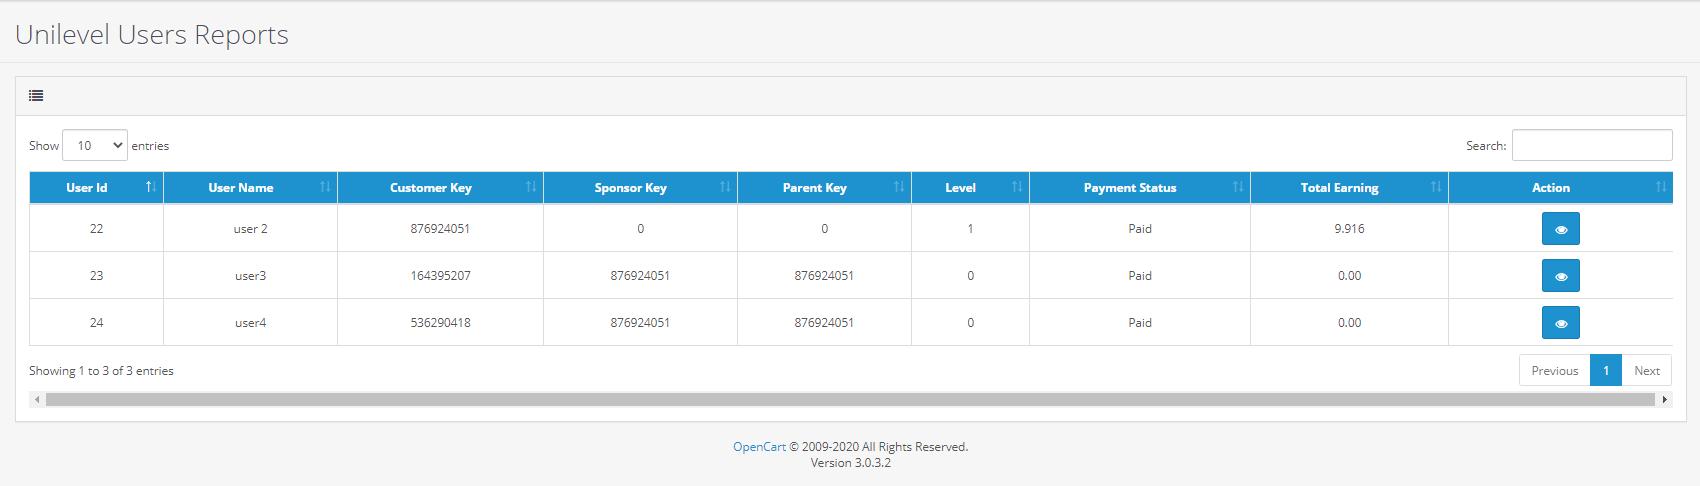 |'Opencart'| |'letscms'| |'opencart unilevel mlm plan'|  |'user report'| |'Dashboard'| |'unilevel mlm plan'| |'mlm'| |'mlm Plan'|  |'setting'| |'new users'| |'unilevel'| |'unilevel mlm extension'| |'costomer list'| |'new users'| |'Installer'| |'mlmtrees.com'| |'mlm plan'| |'extension'| |'Opencart mlm plan'|